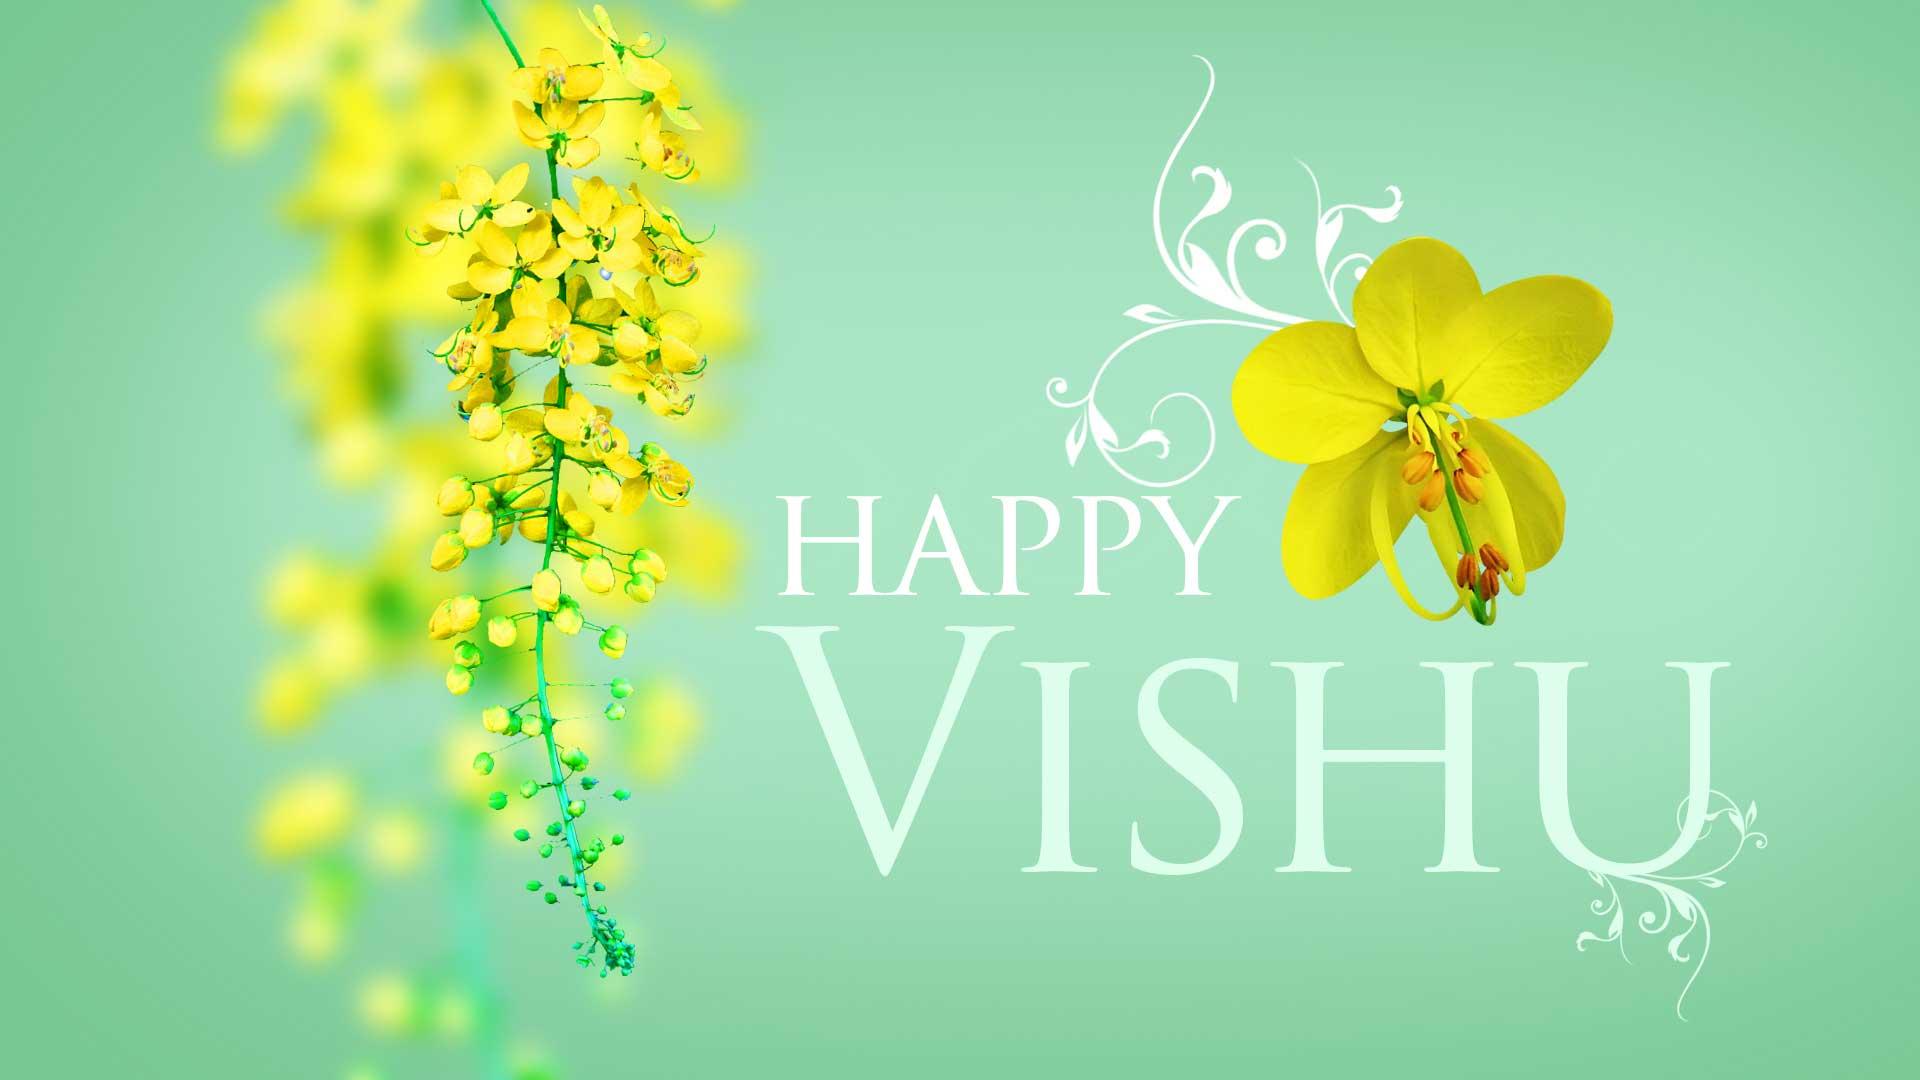 Free Vishu Greeting Cards Free Vishu Ecards Aqua Green Kerala